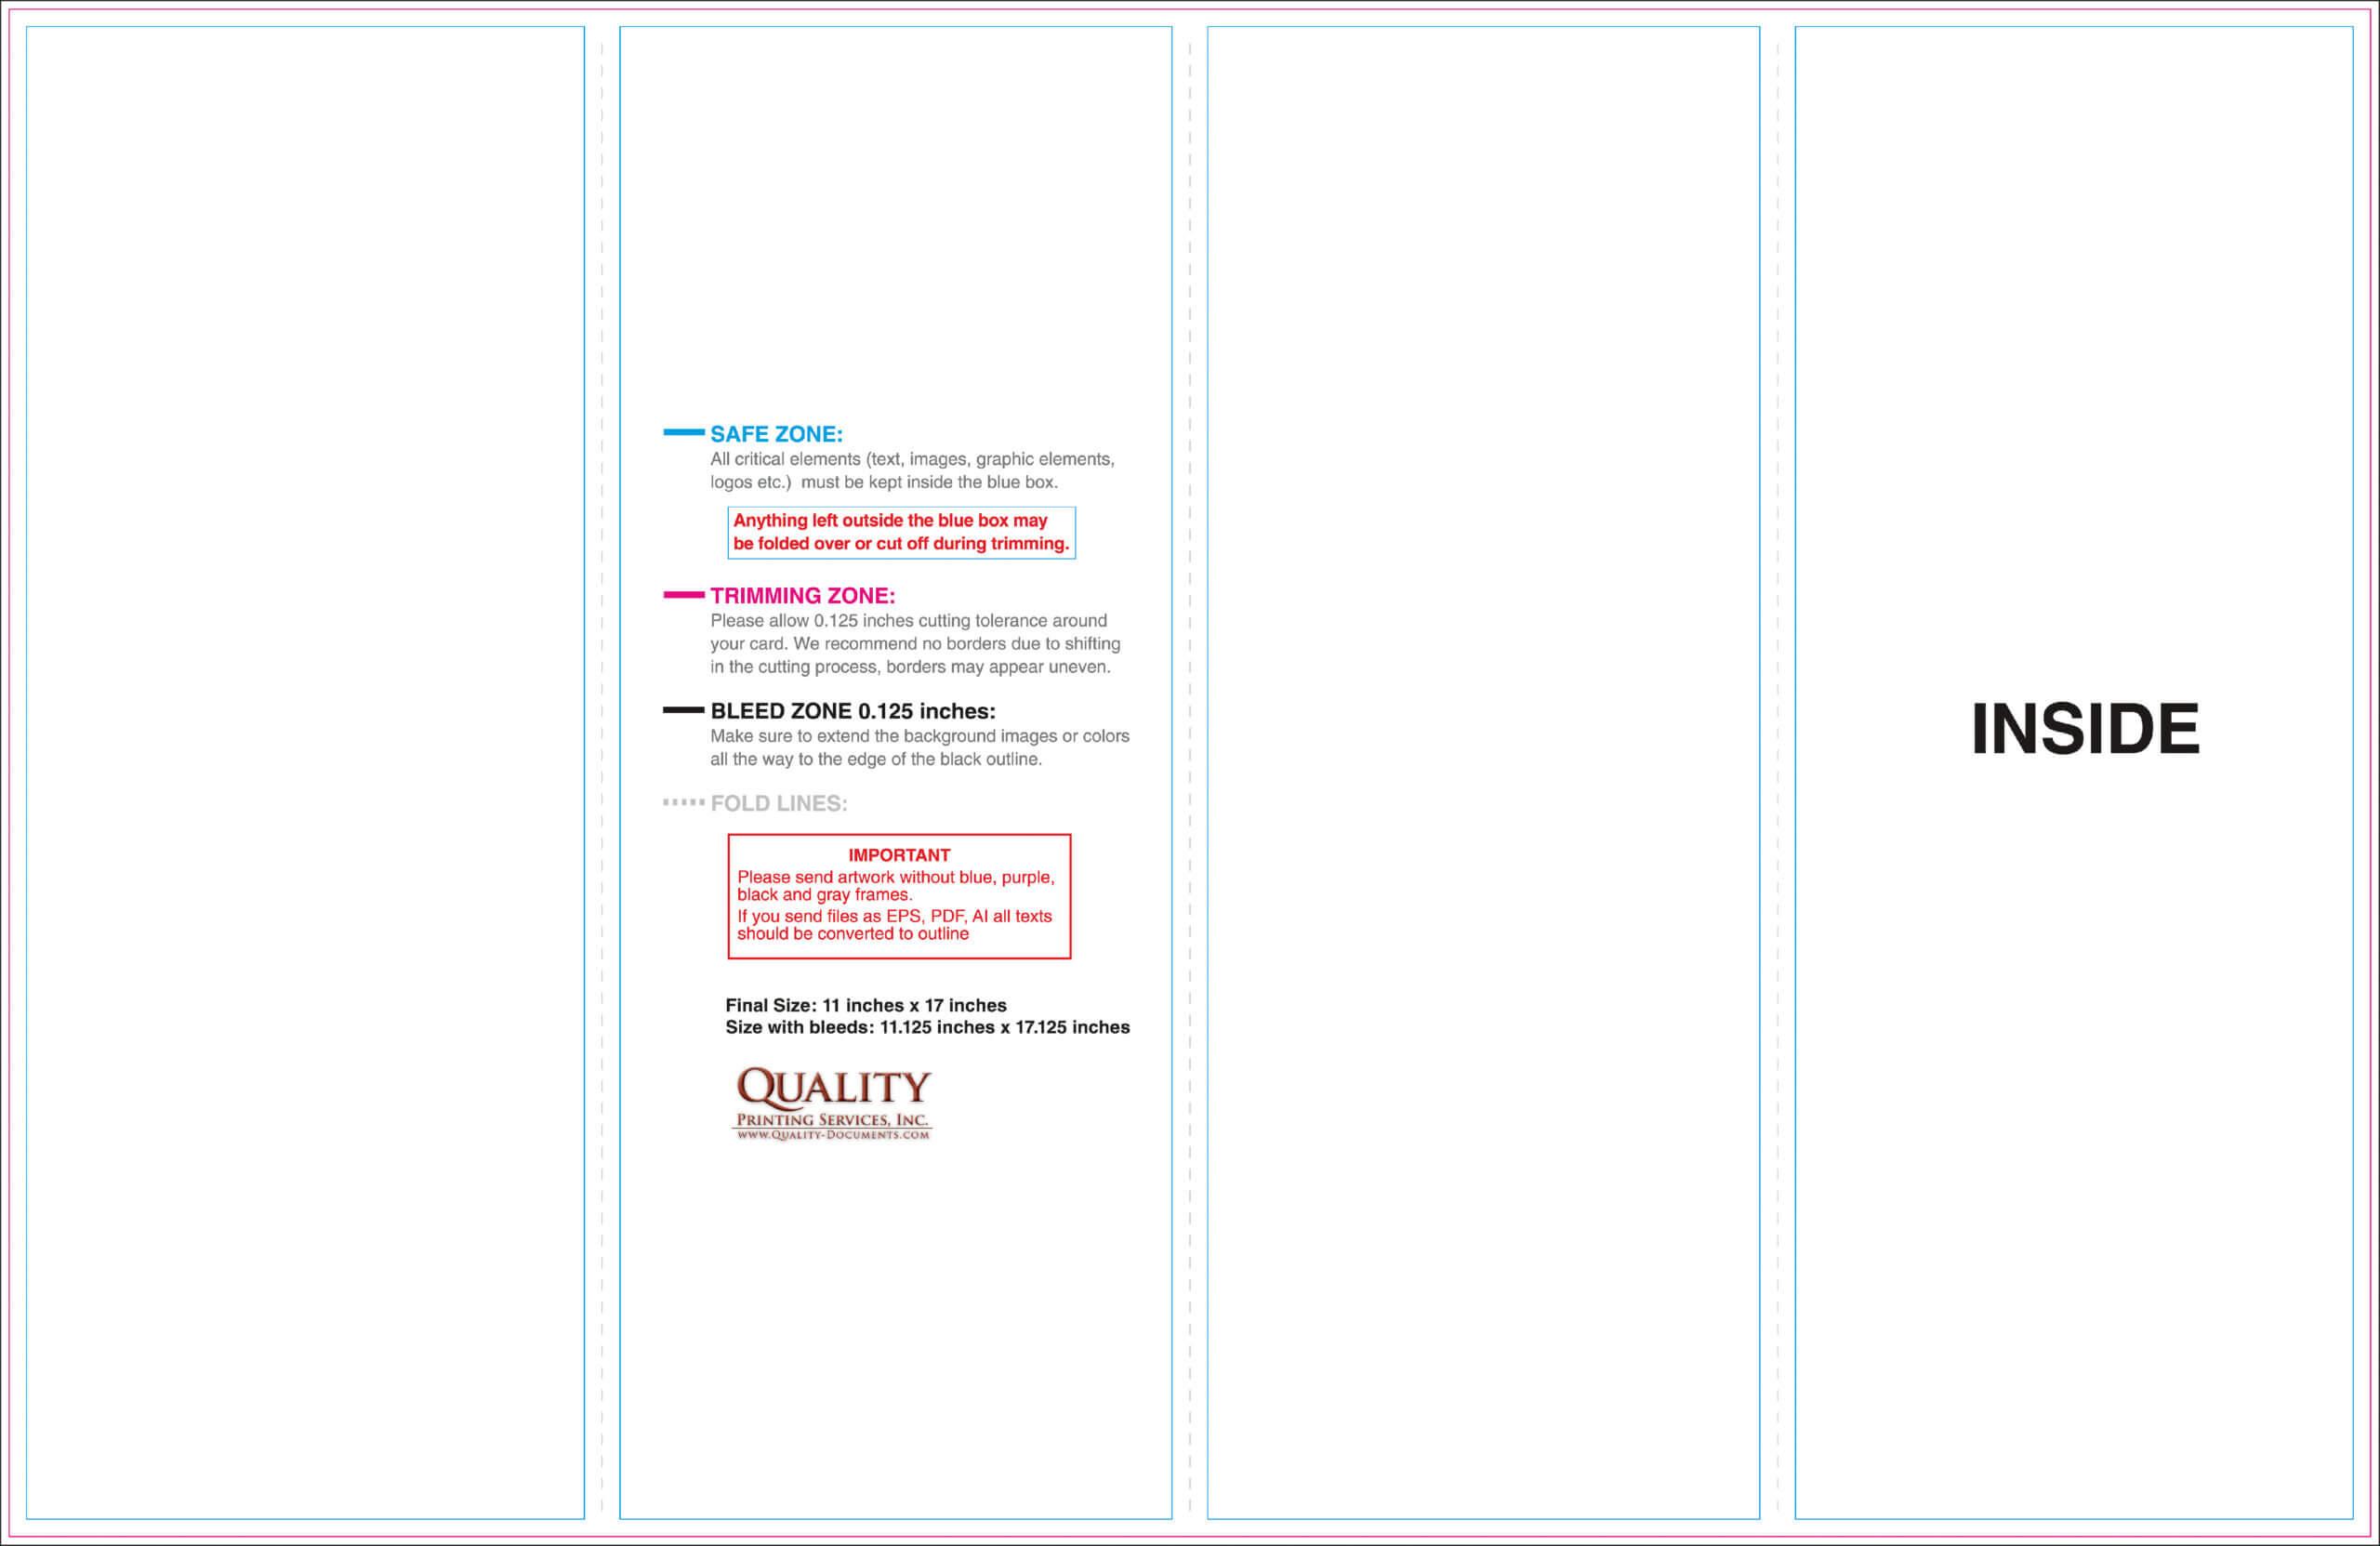 11X17 Brochure Templates With Regard To 11X17 Brochure Template